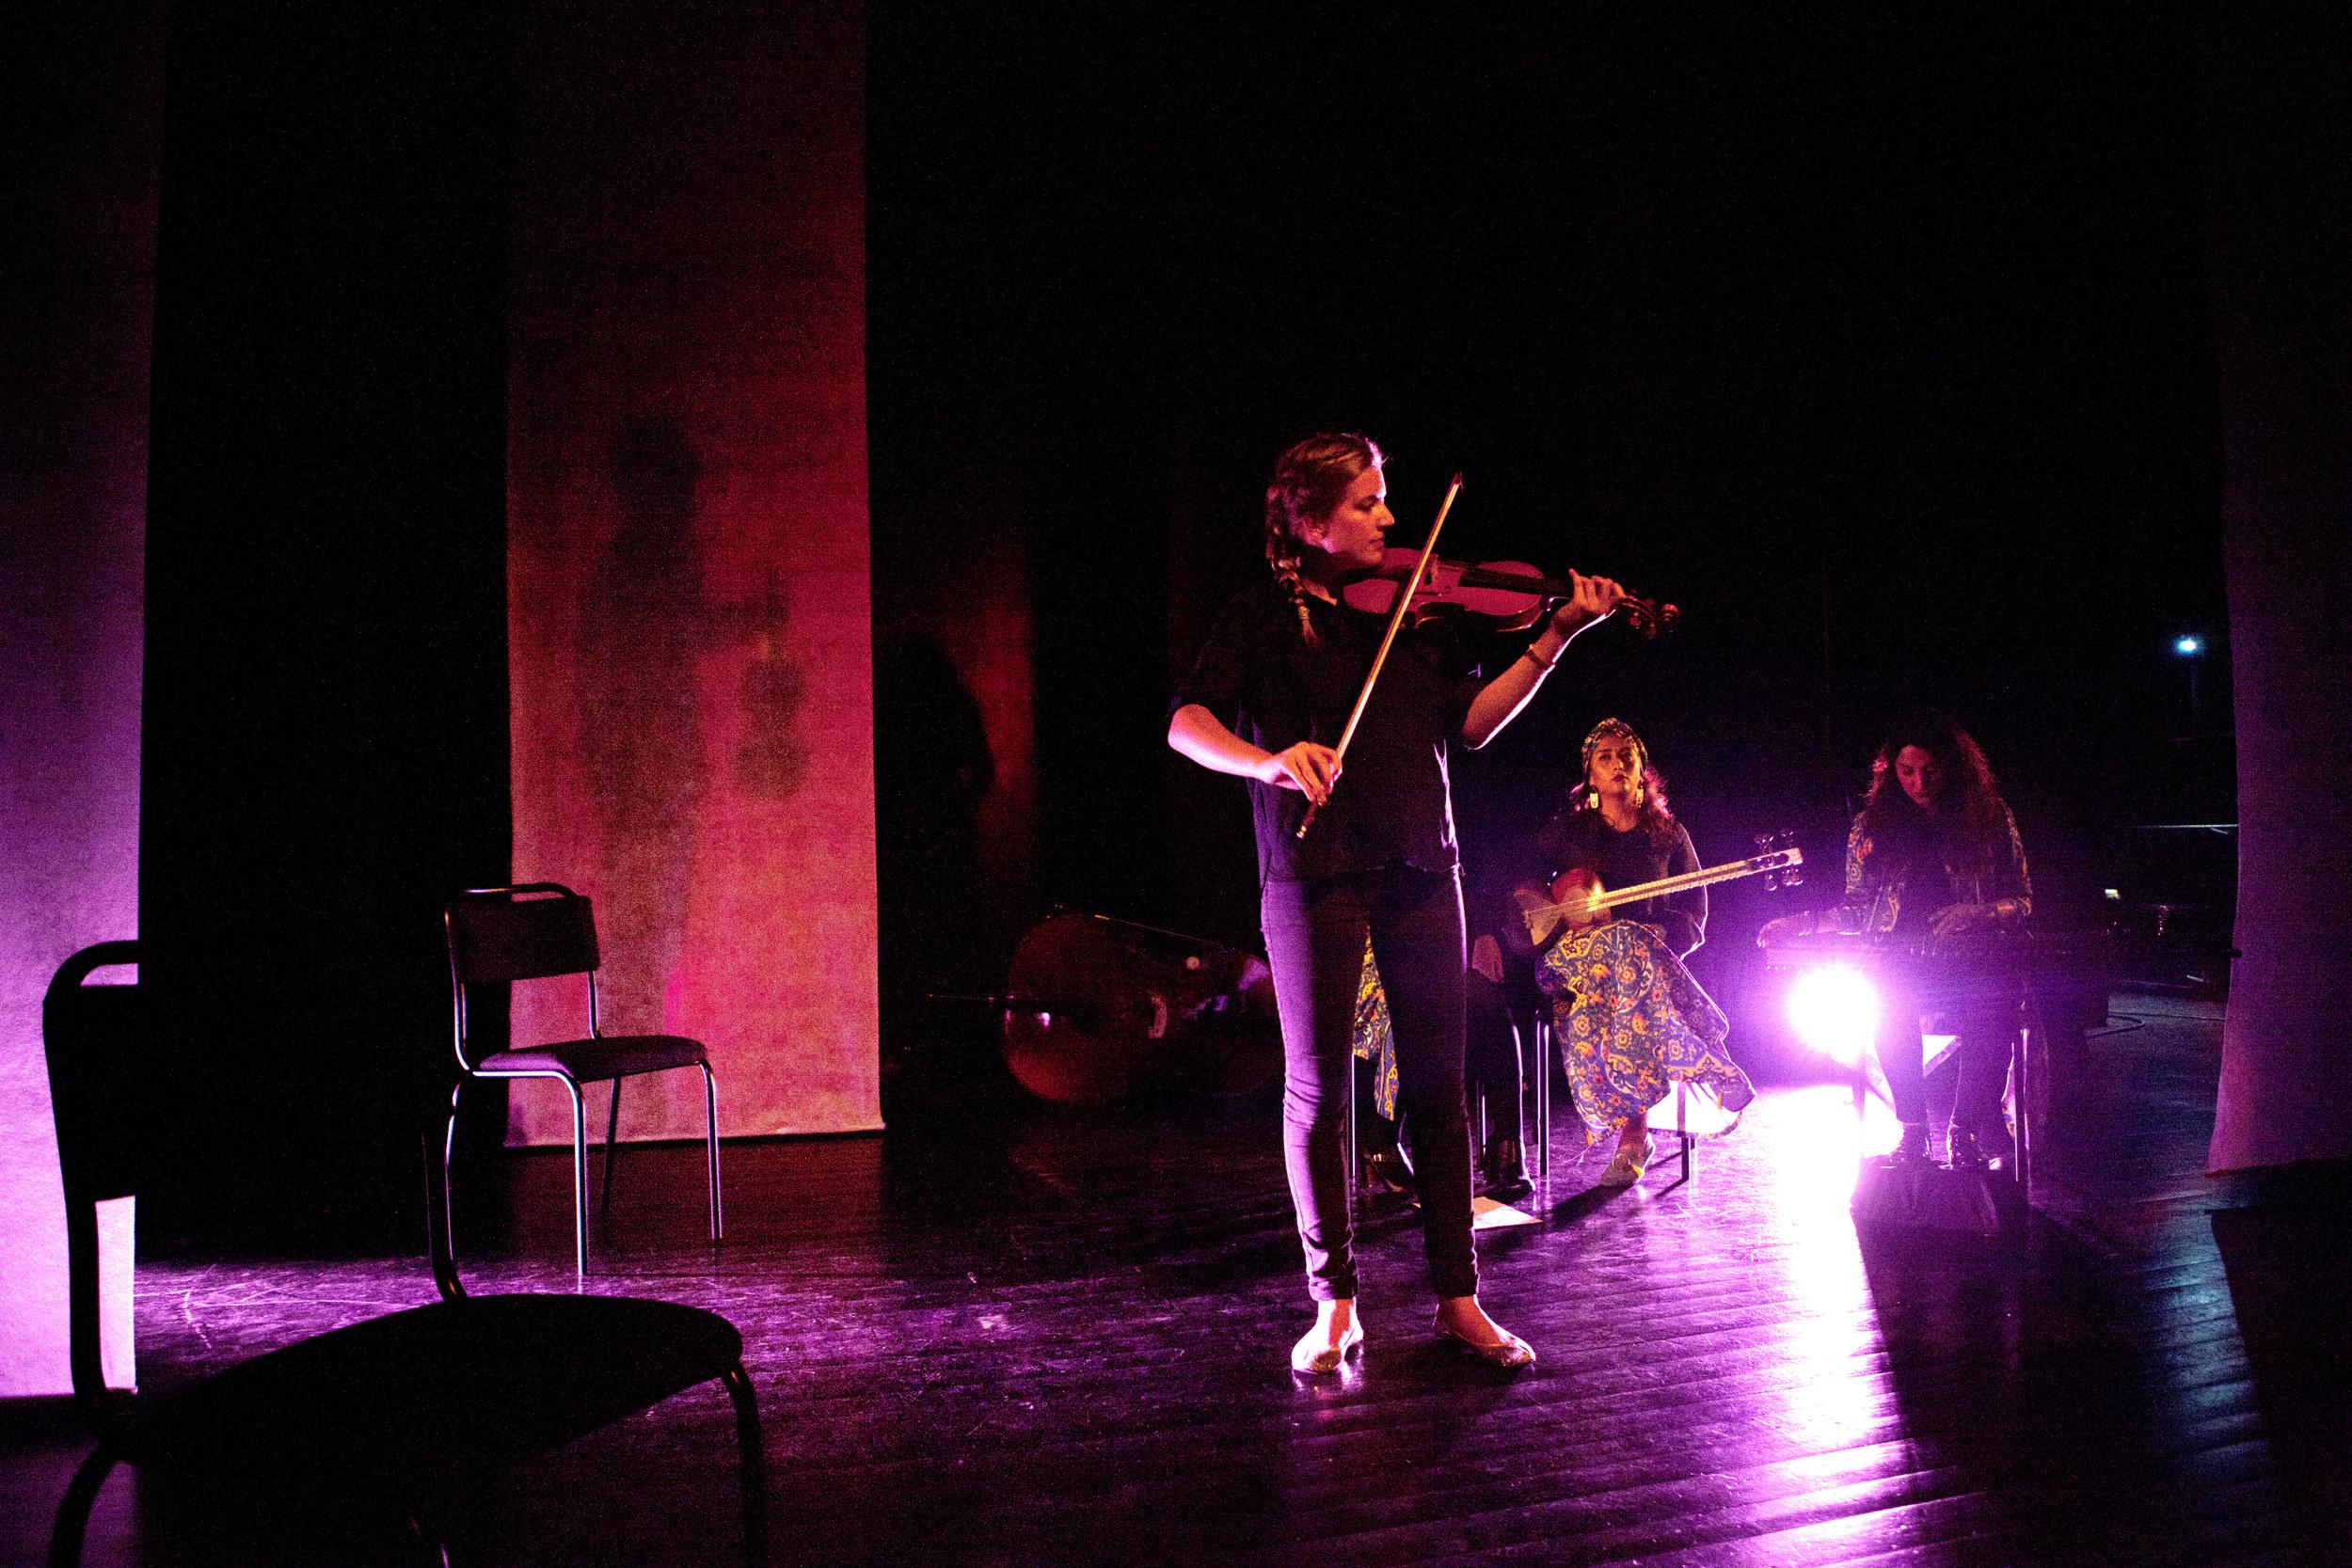 talent - teatersalen - 4. juli - heidi hattestein - IMG_5387.jpg